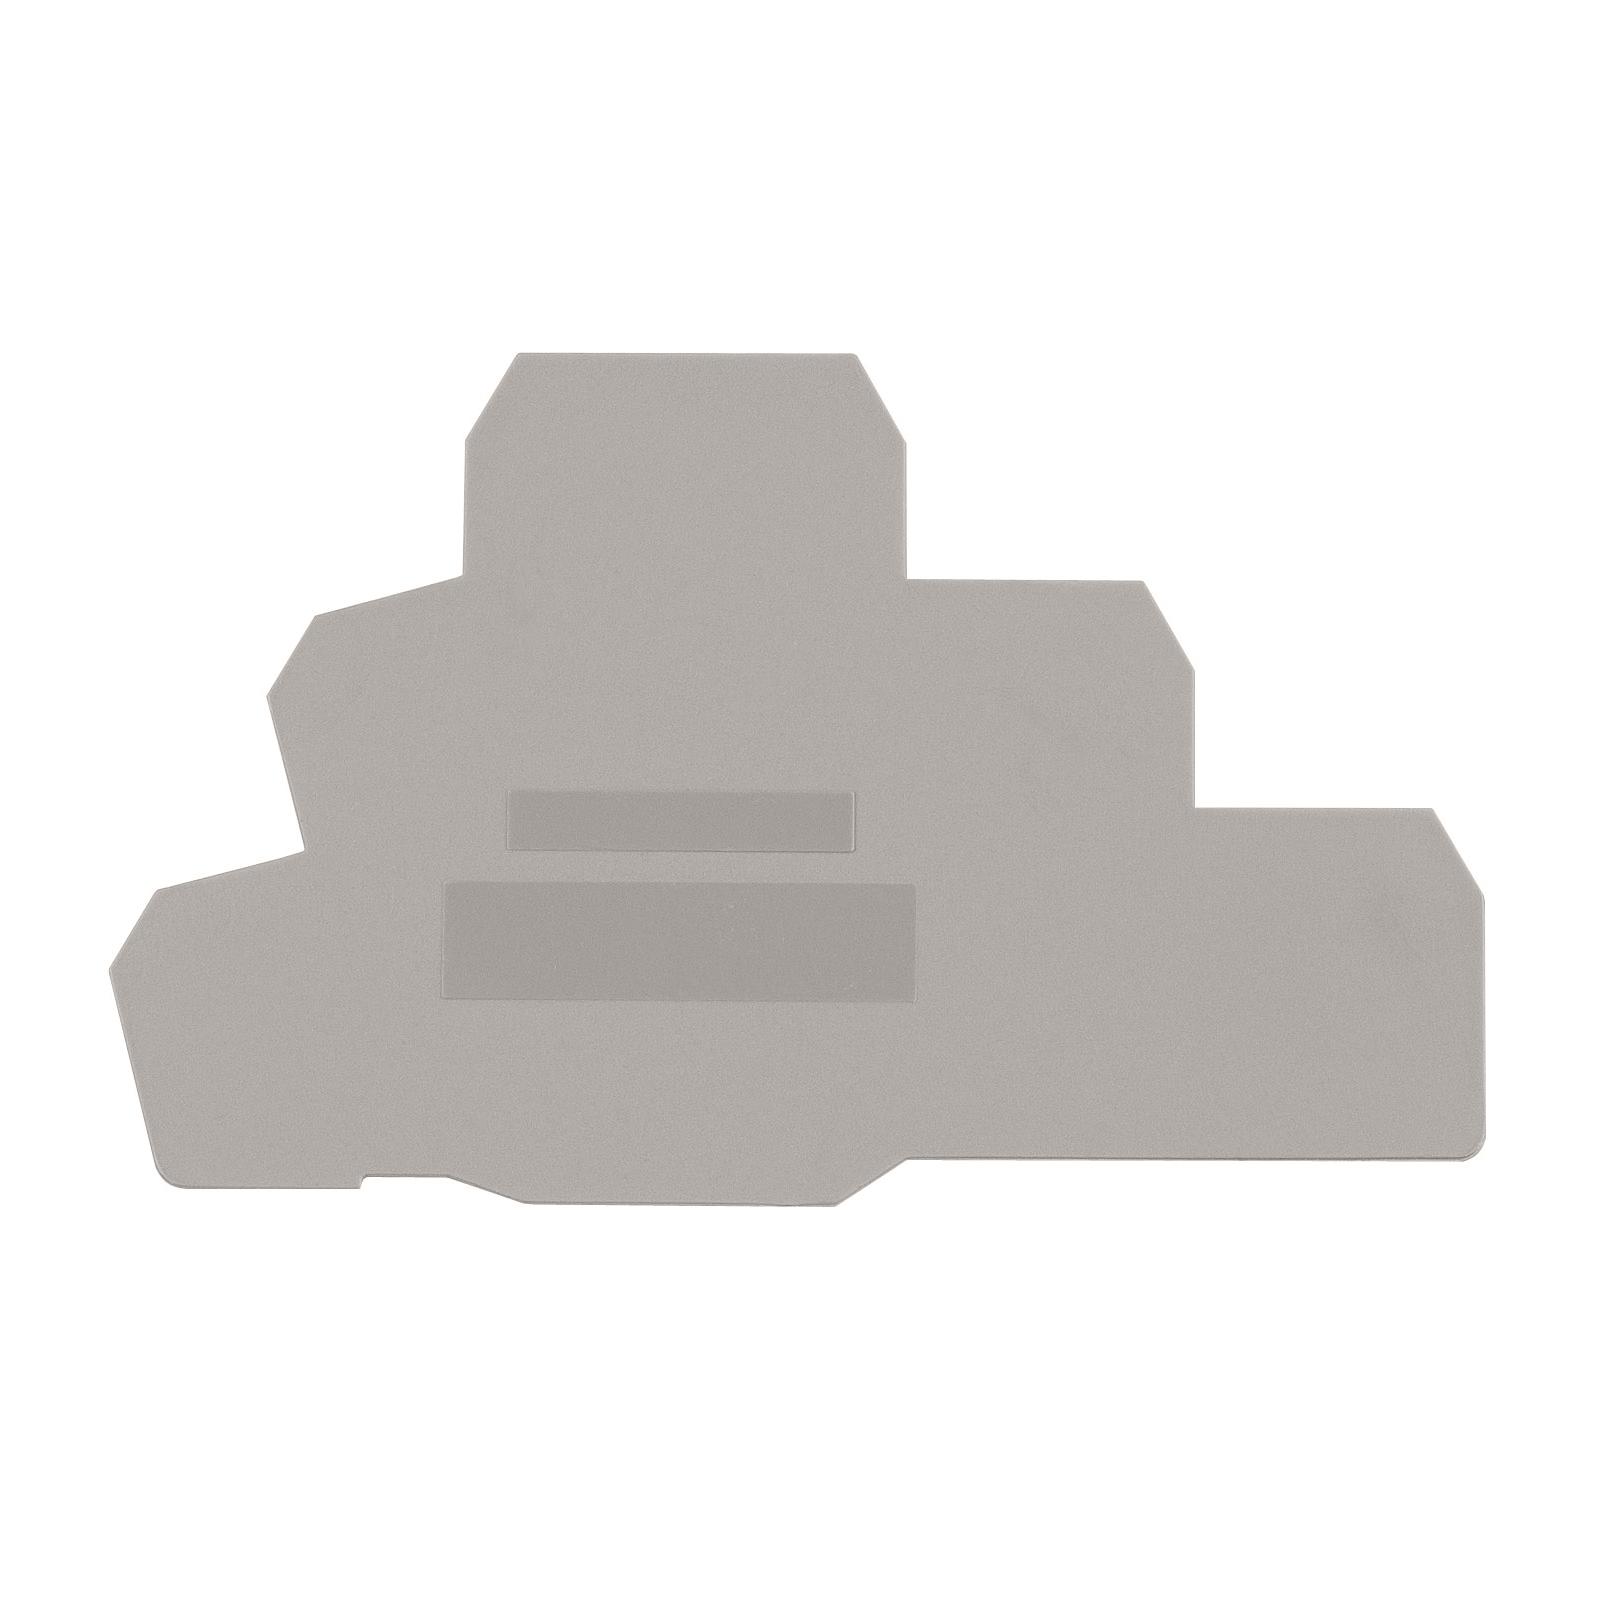 1 Stk Endplatte für Dreistockklemme Type PUK3 IK680201--